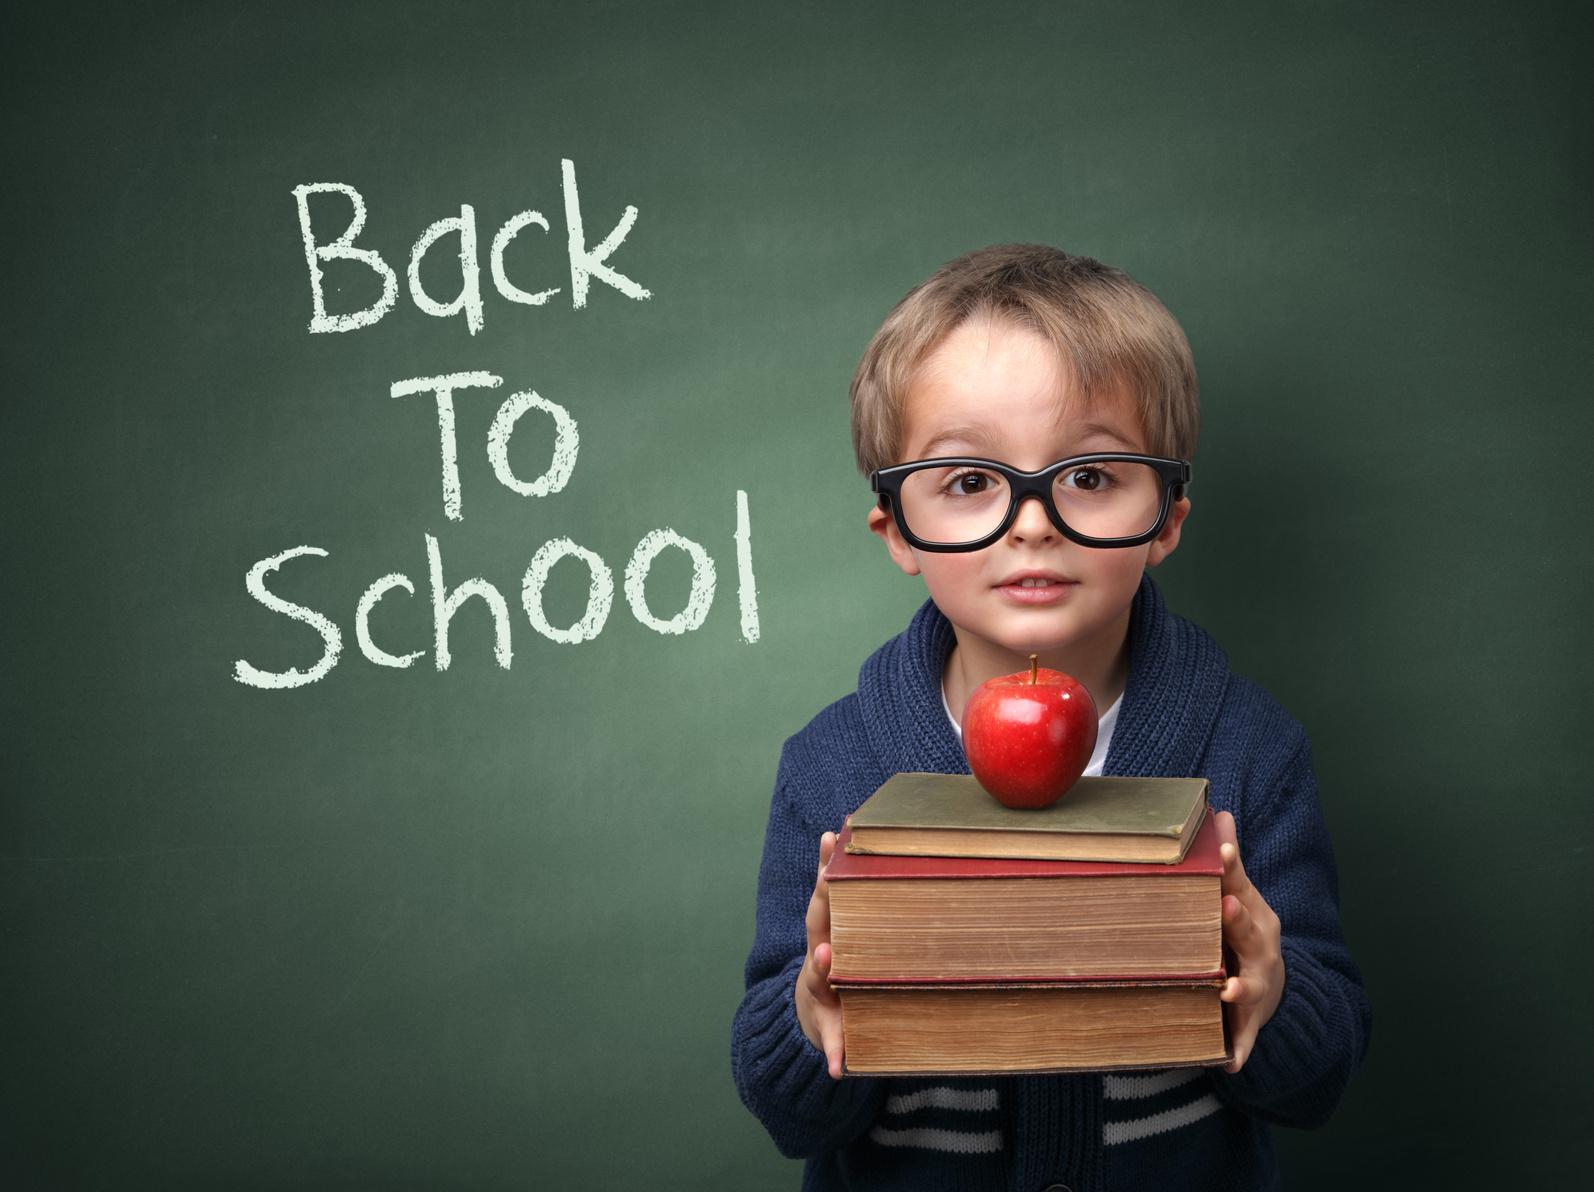 Scotia Back to School Routine